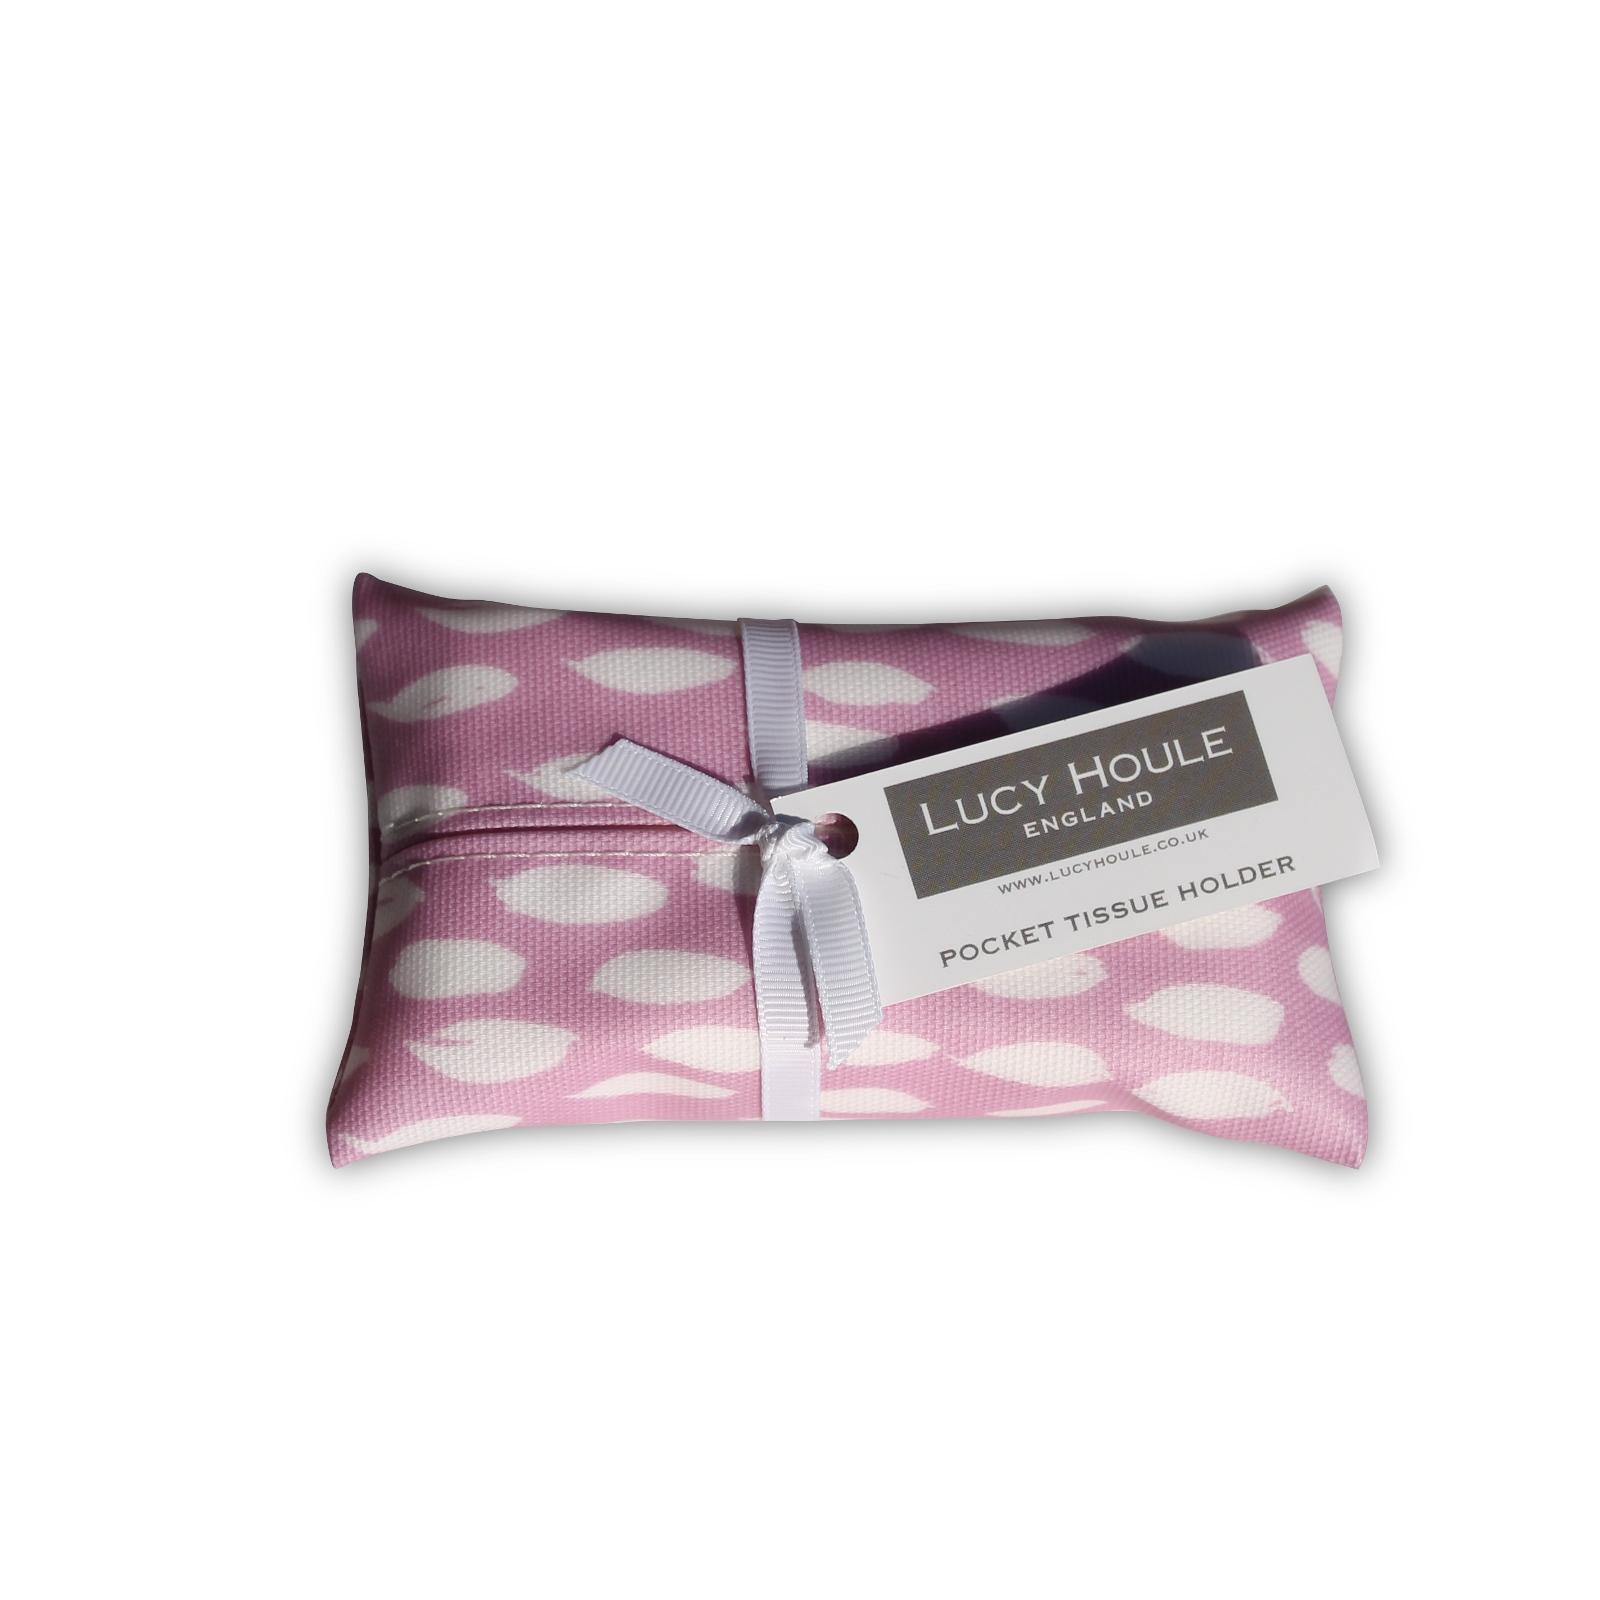 Sherbet Feather Pocket Tissue Holder